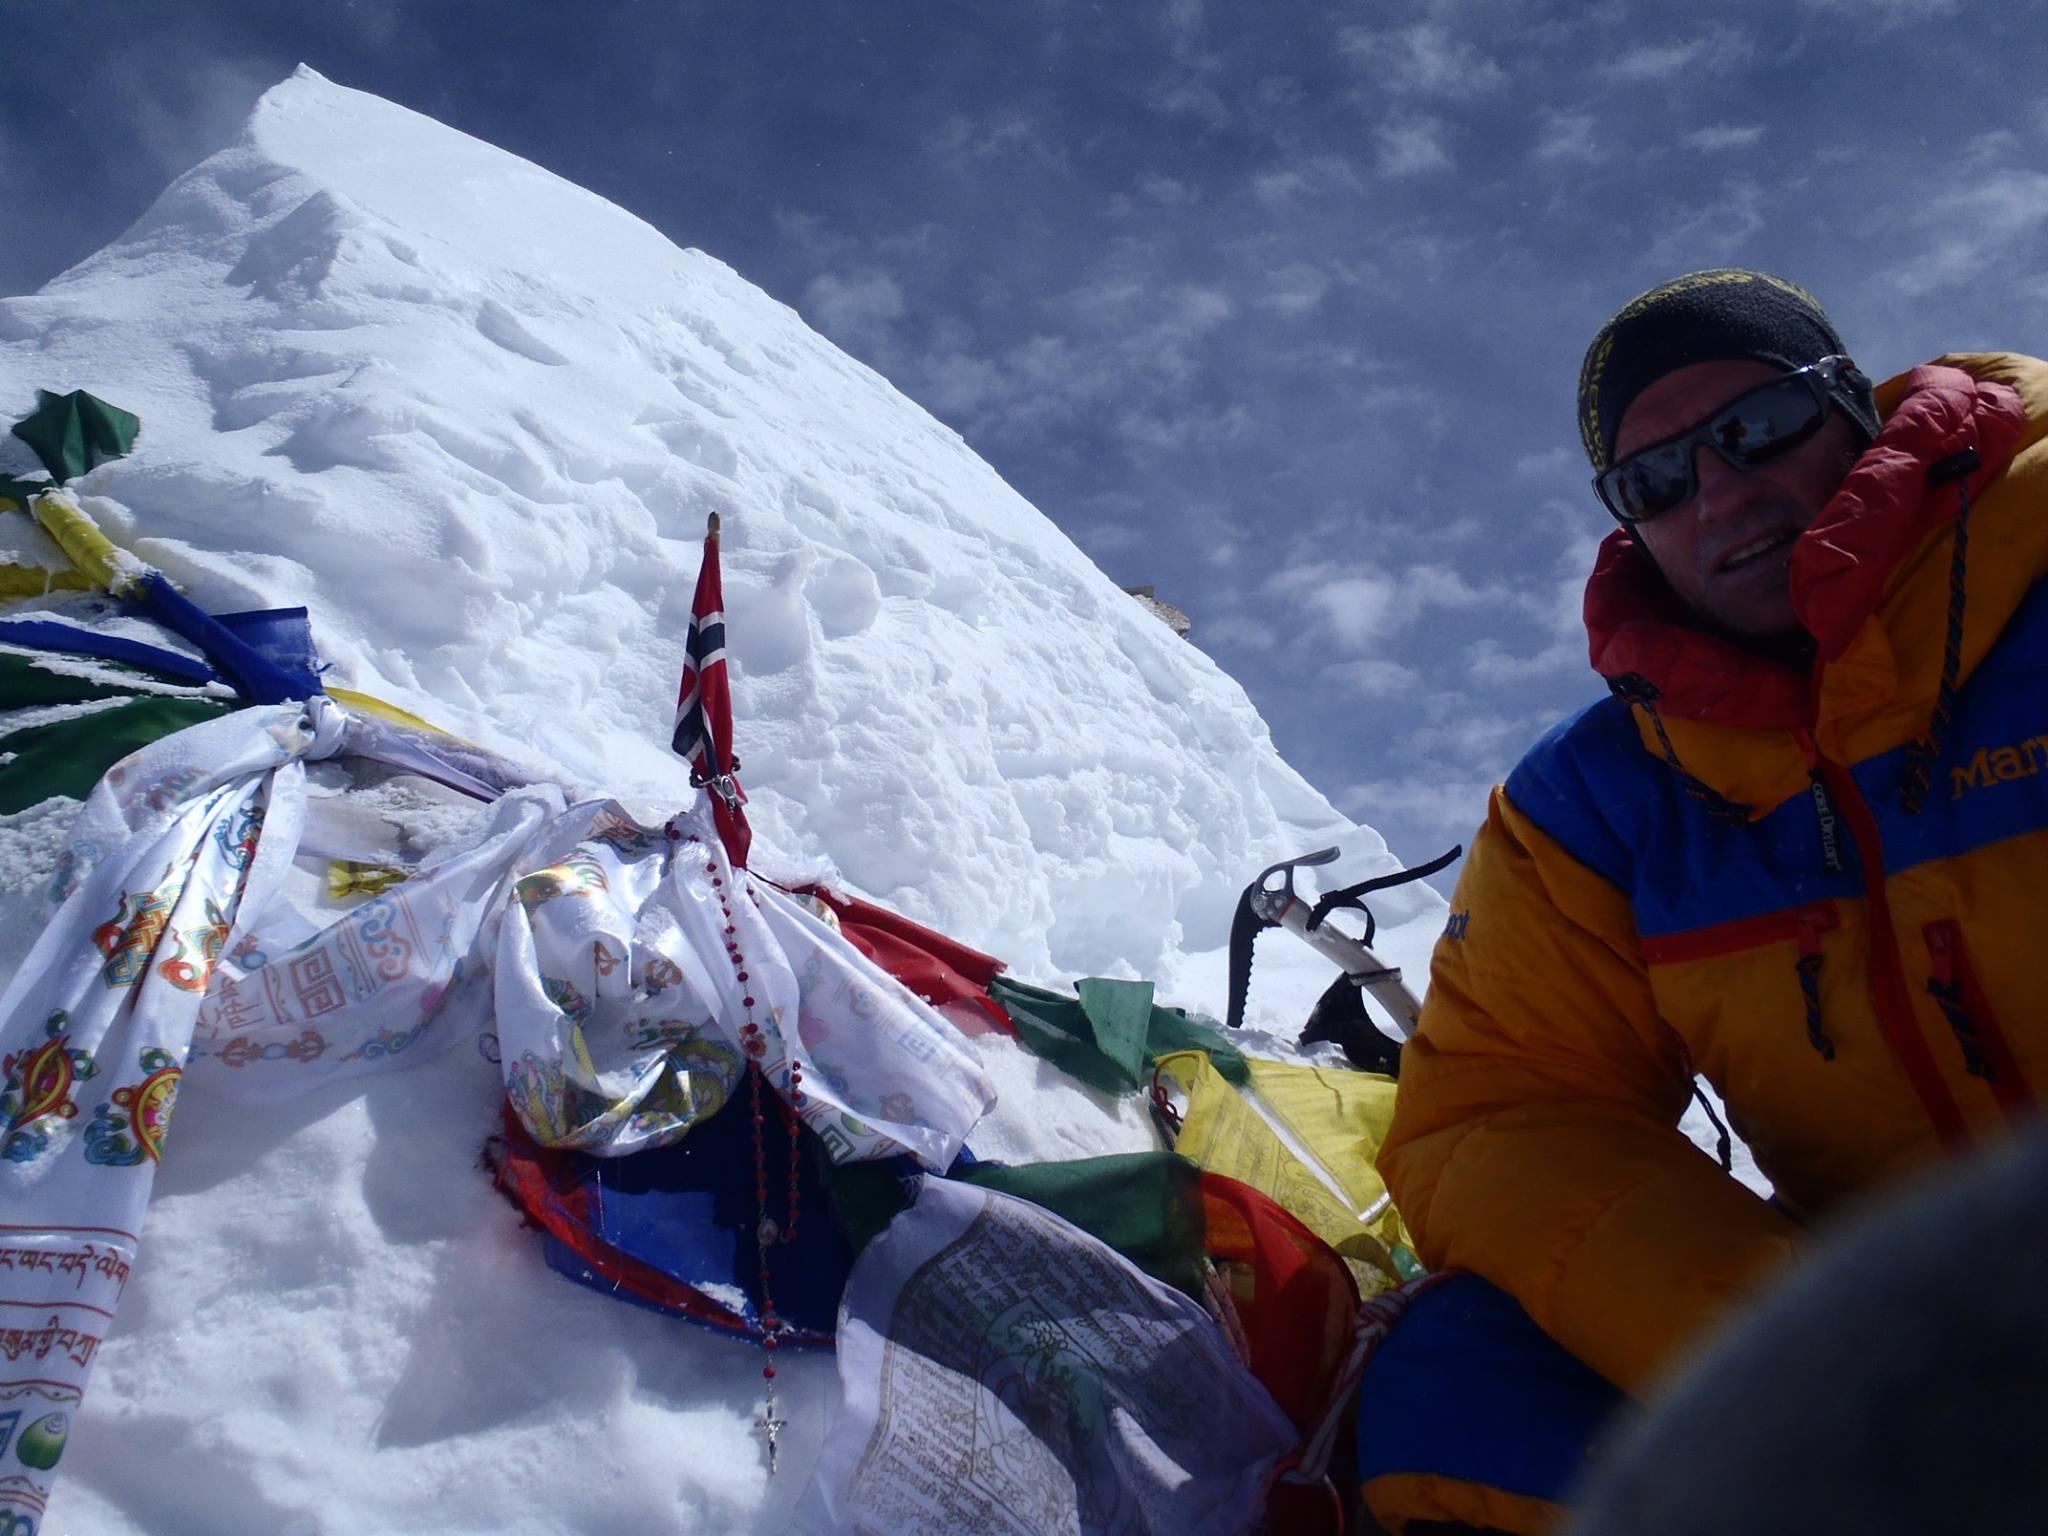 Antonio Jesus Velez Ruiz a Himalájában Forrás: Antonio Jesus Velez Ruiz Facebook